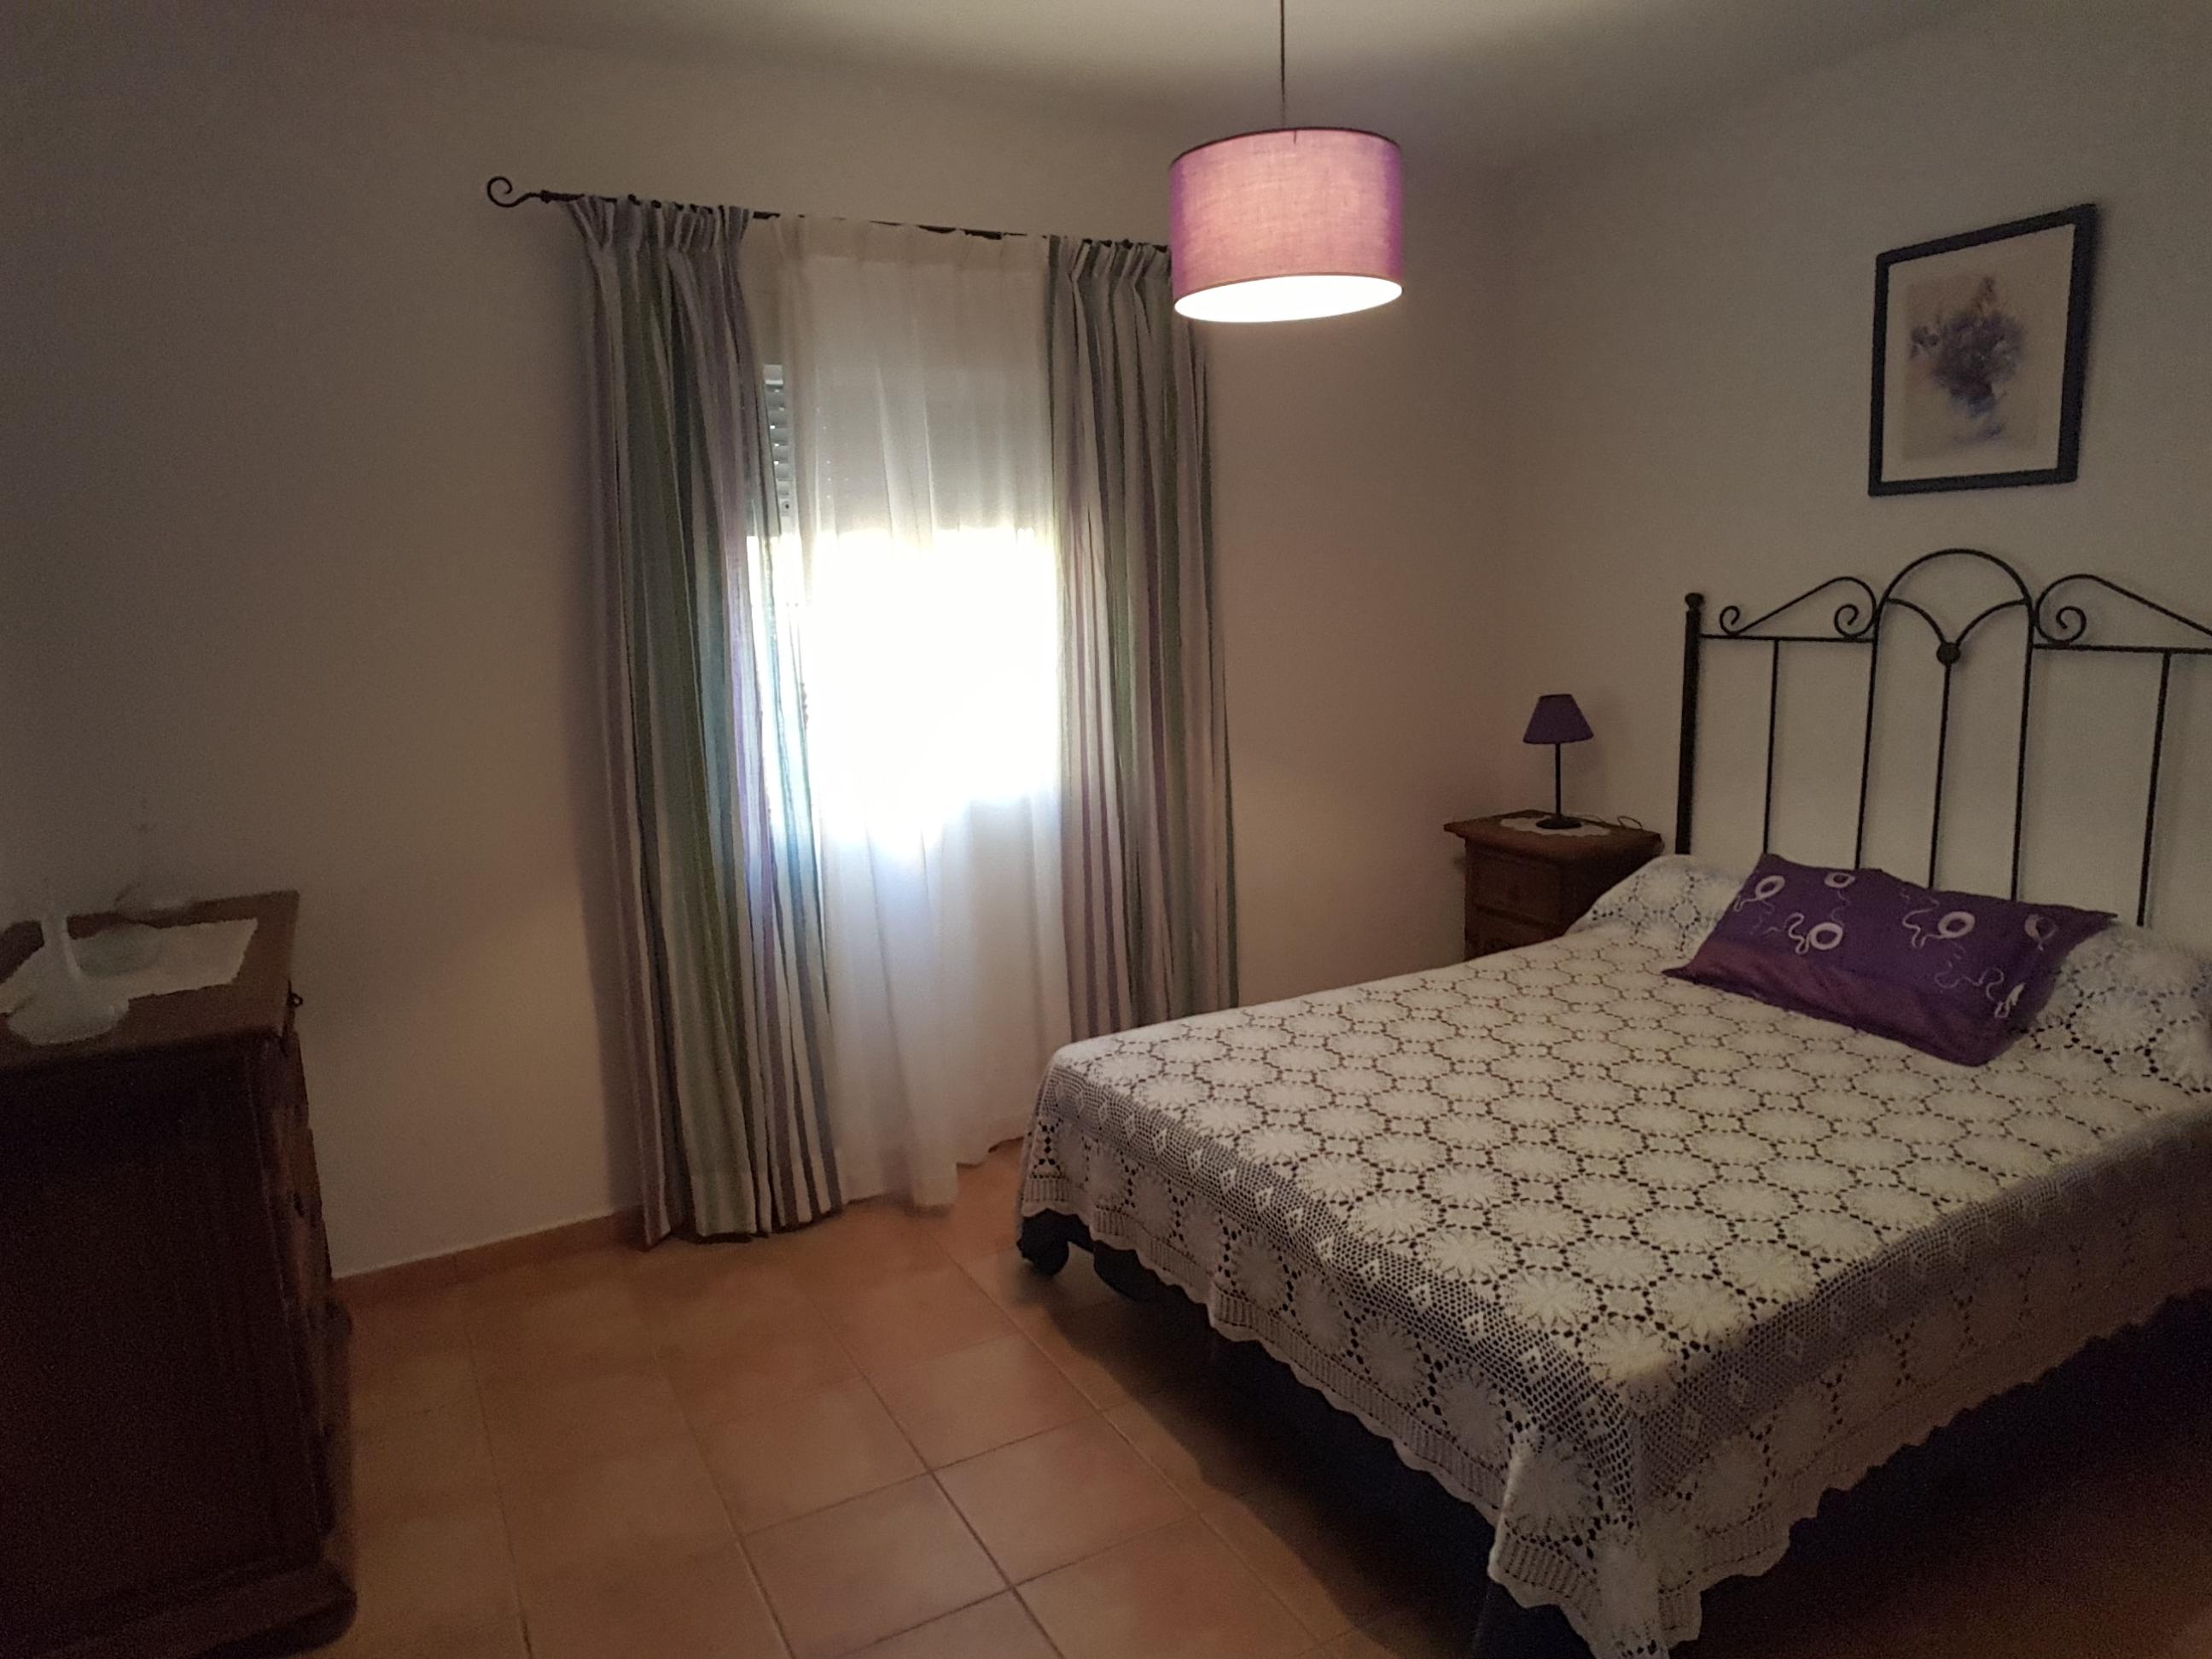 Apartamento barato Chiclana de la Frontera, Cádiz